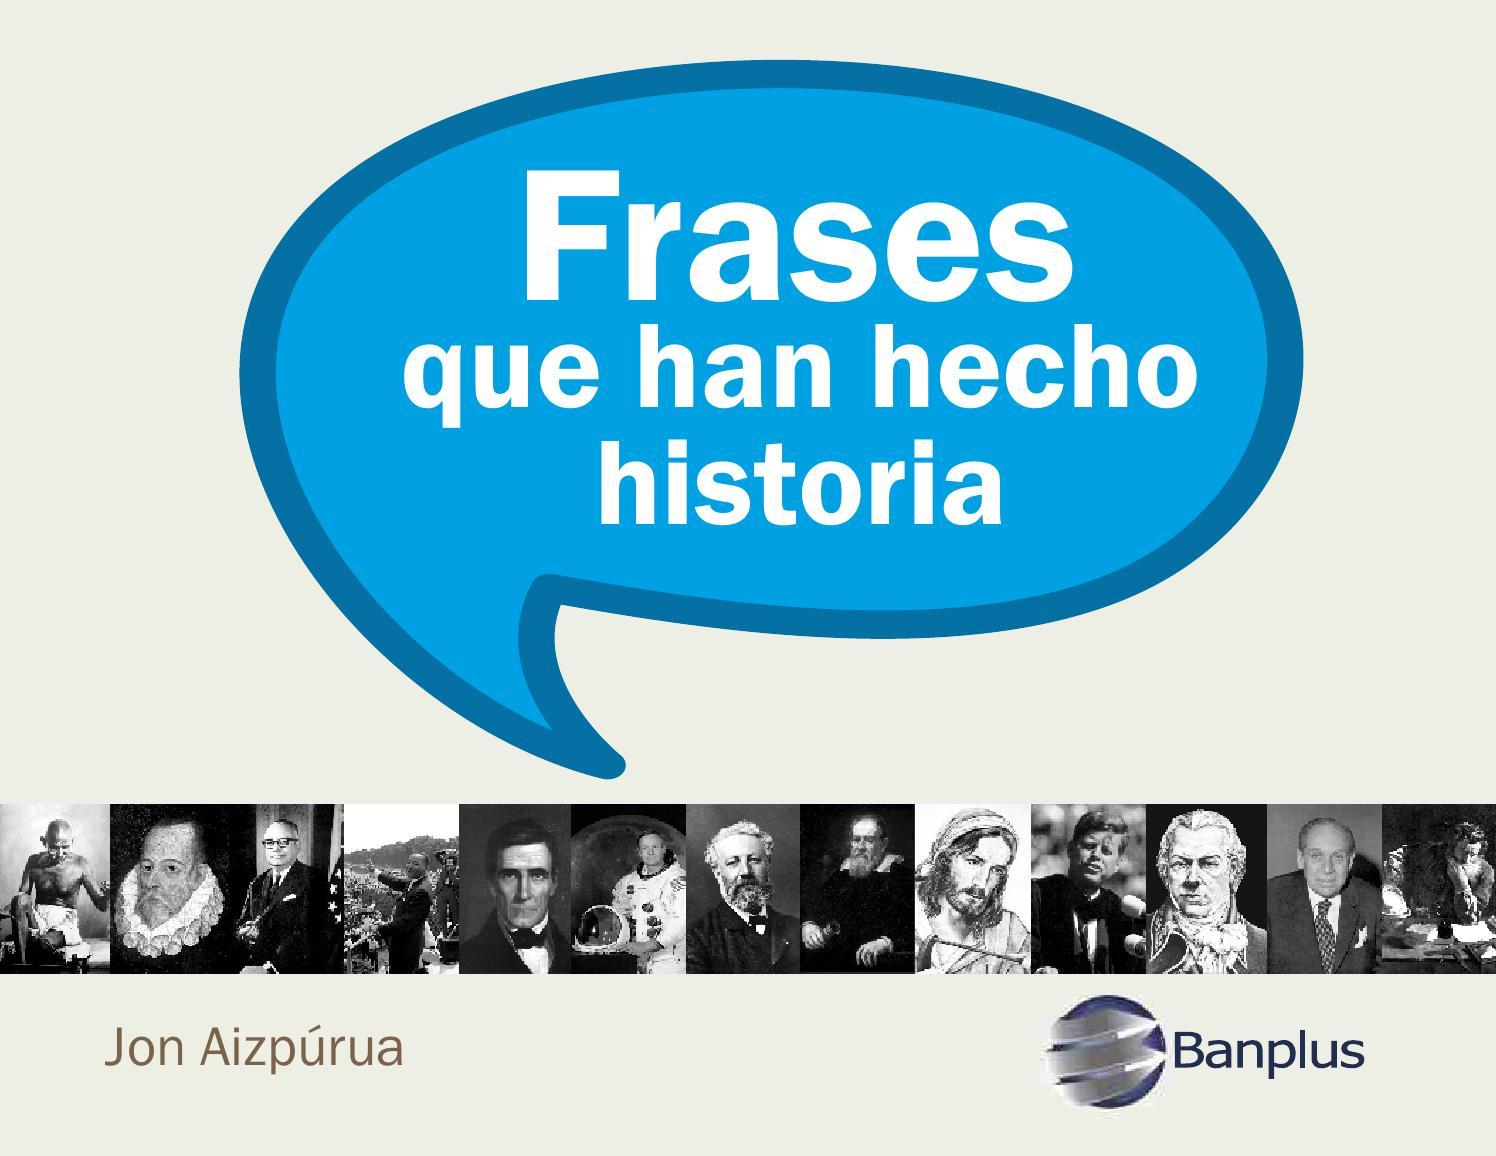 Banplus Frases Que Han Hecho Historia 2 By Banplus Issuu